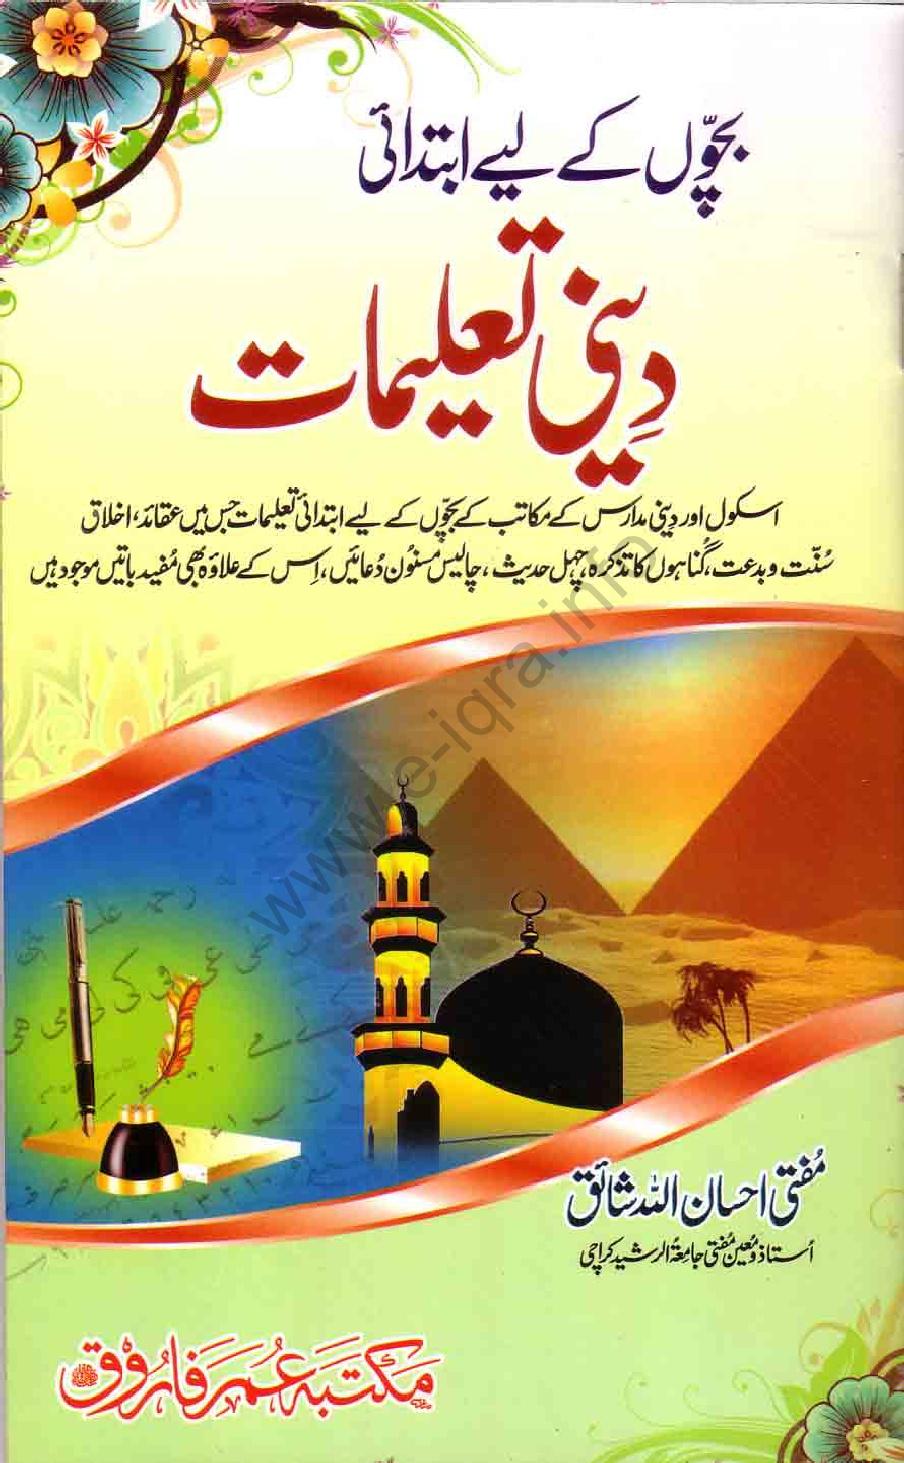 Bachon K Liay Ibtidaee Maloomat   Islamic Books Library